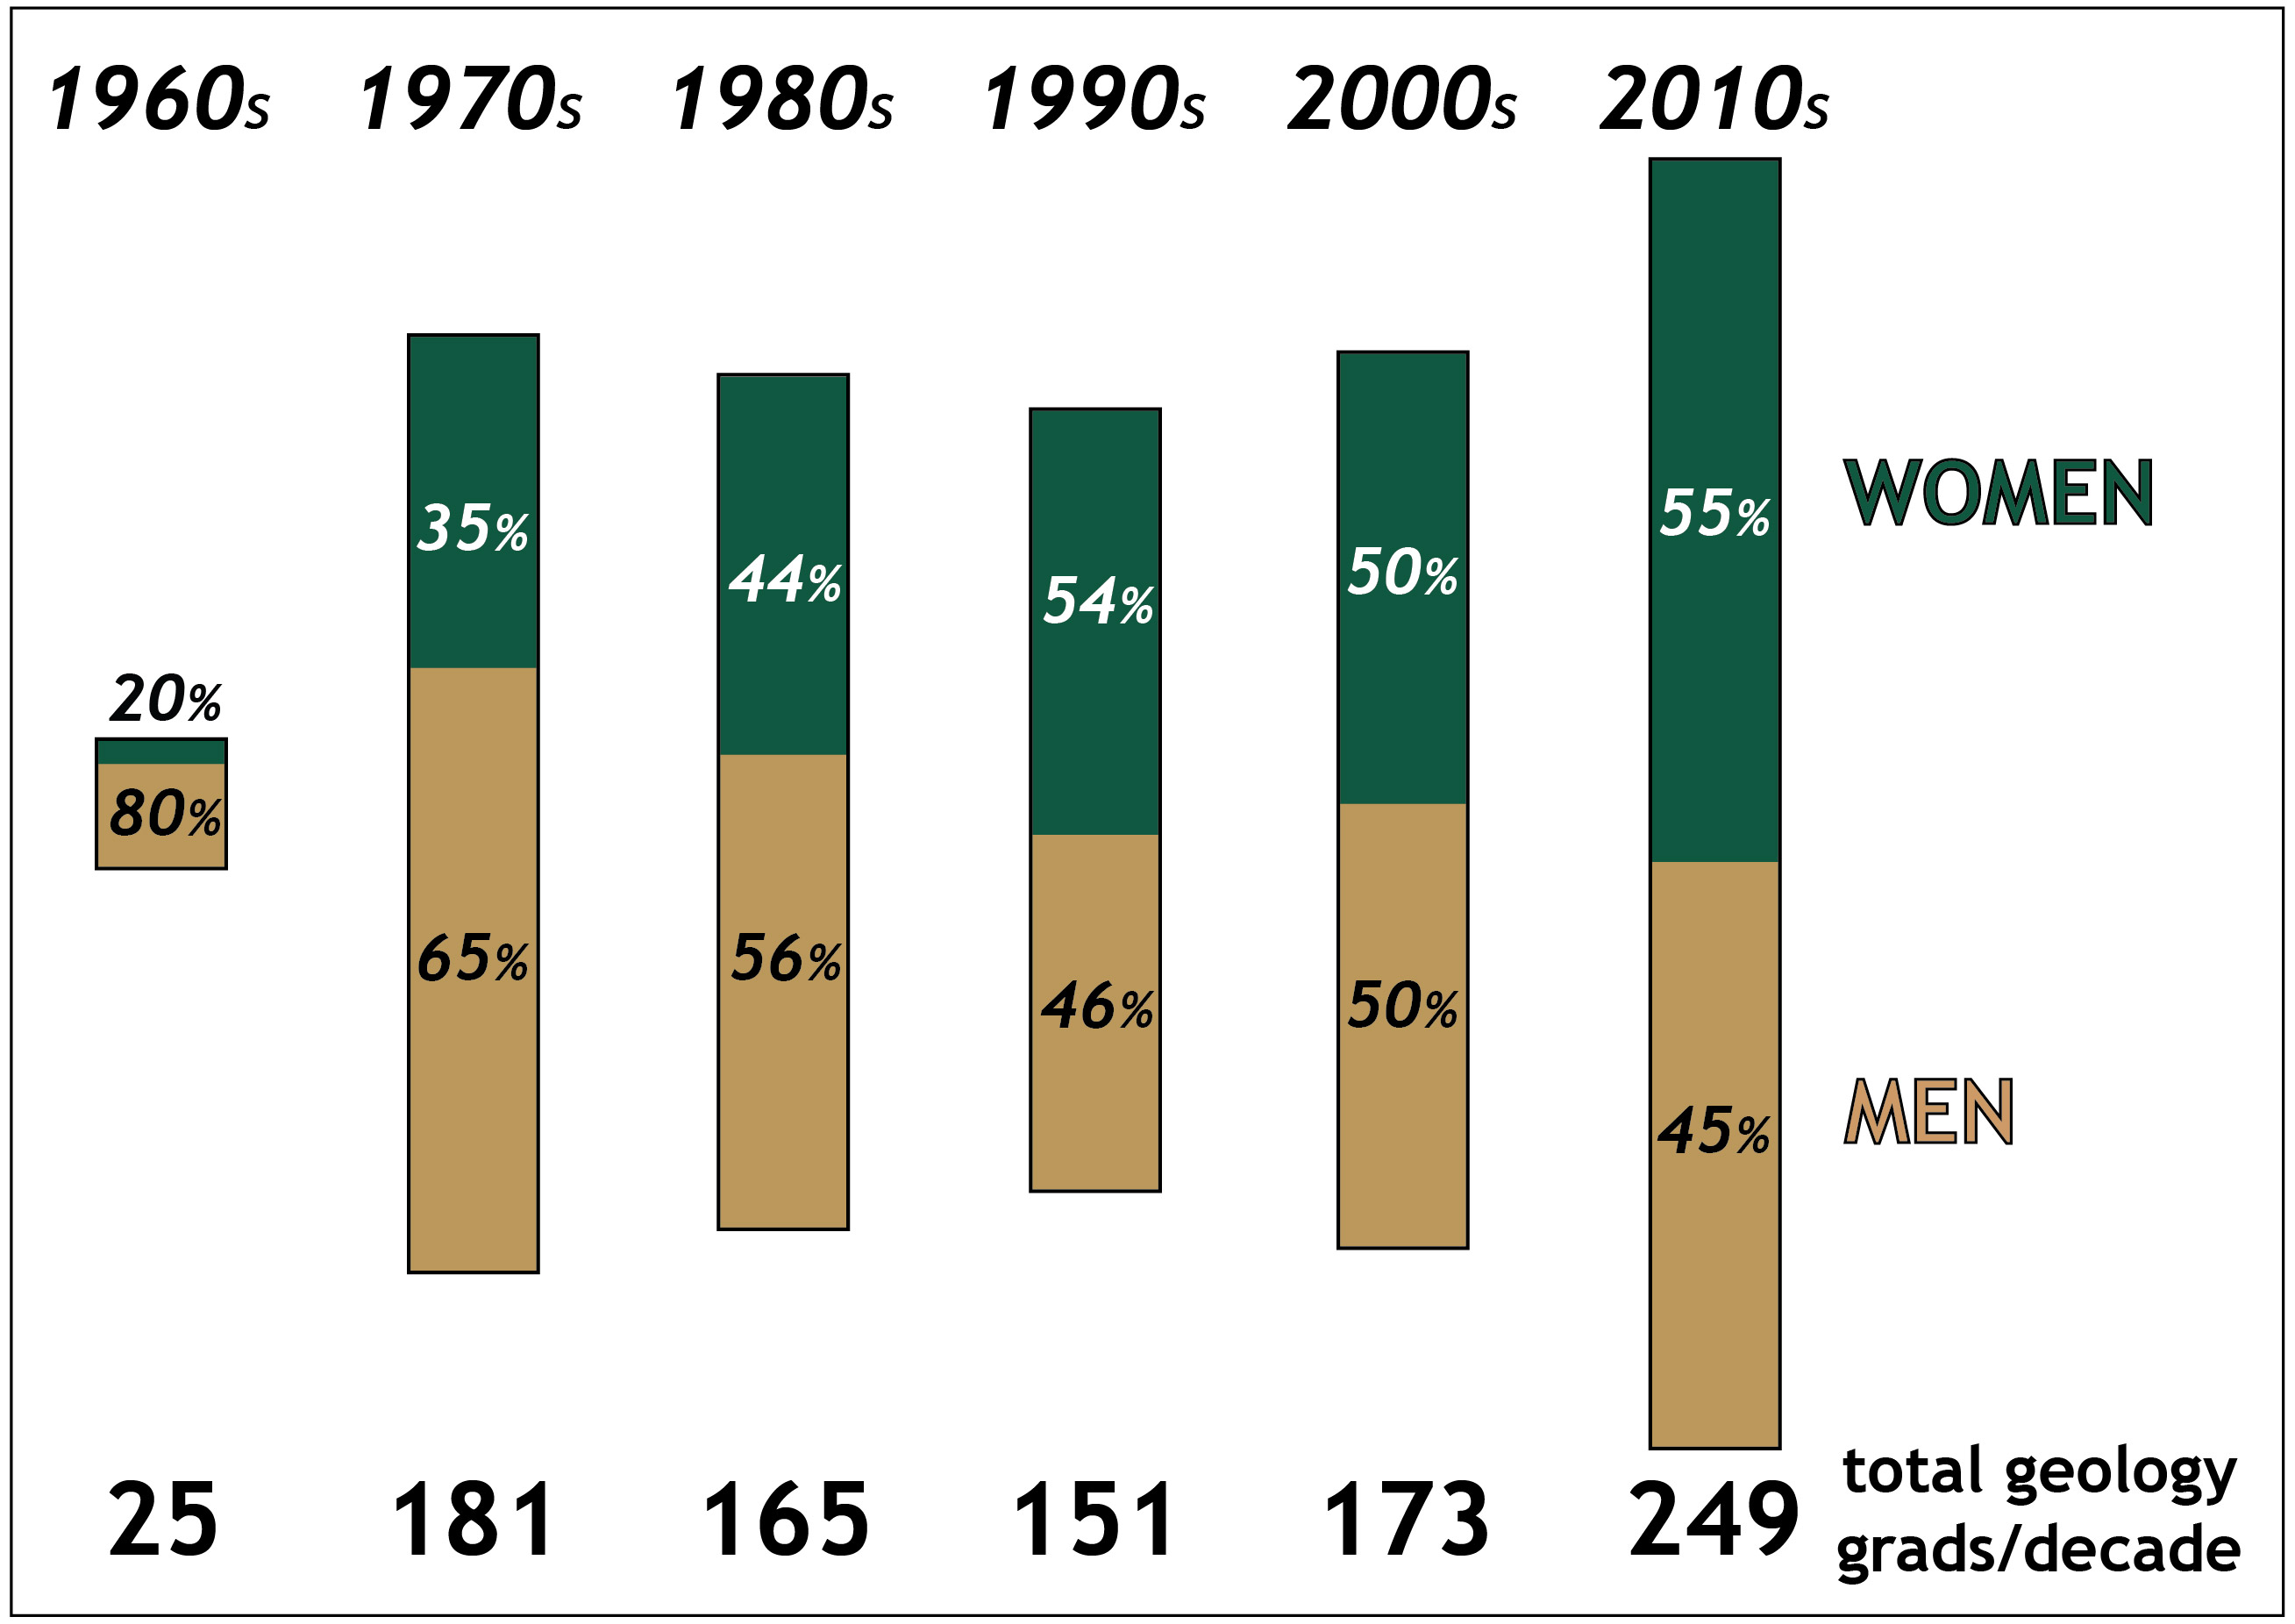 W&M Geology Celebrates 100 Years of Women - The William